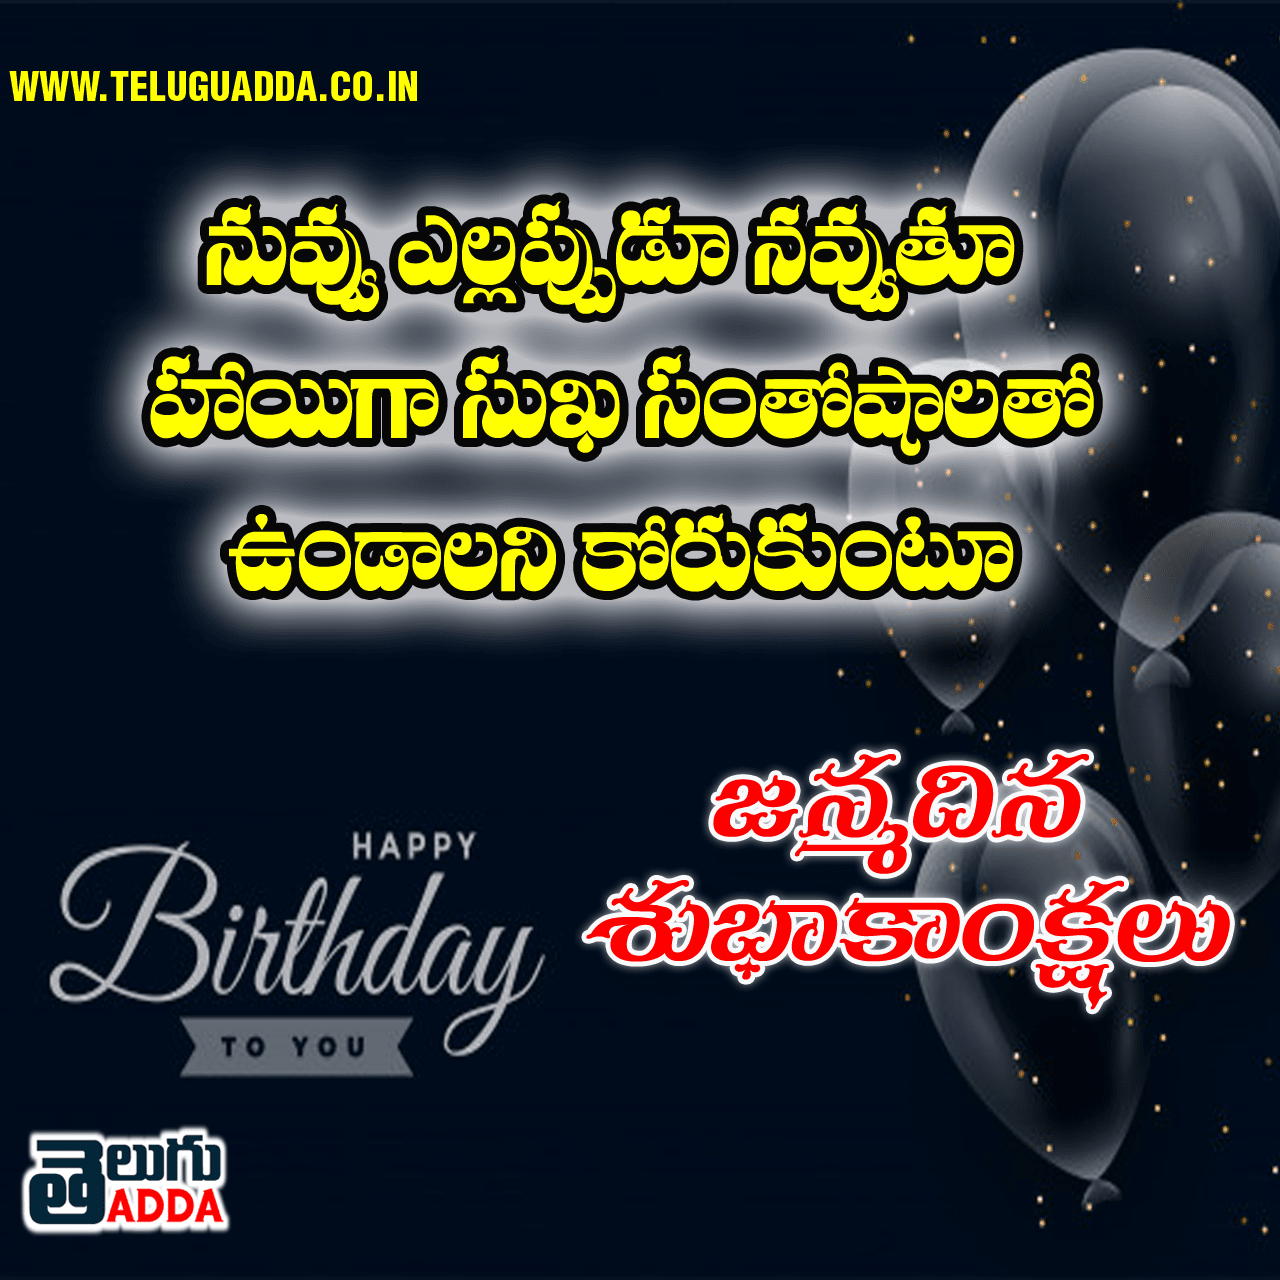 Birthday-Wishes-telugu-Greetings-in-telugu